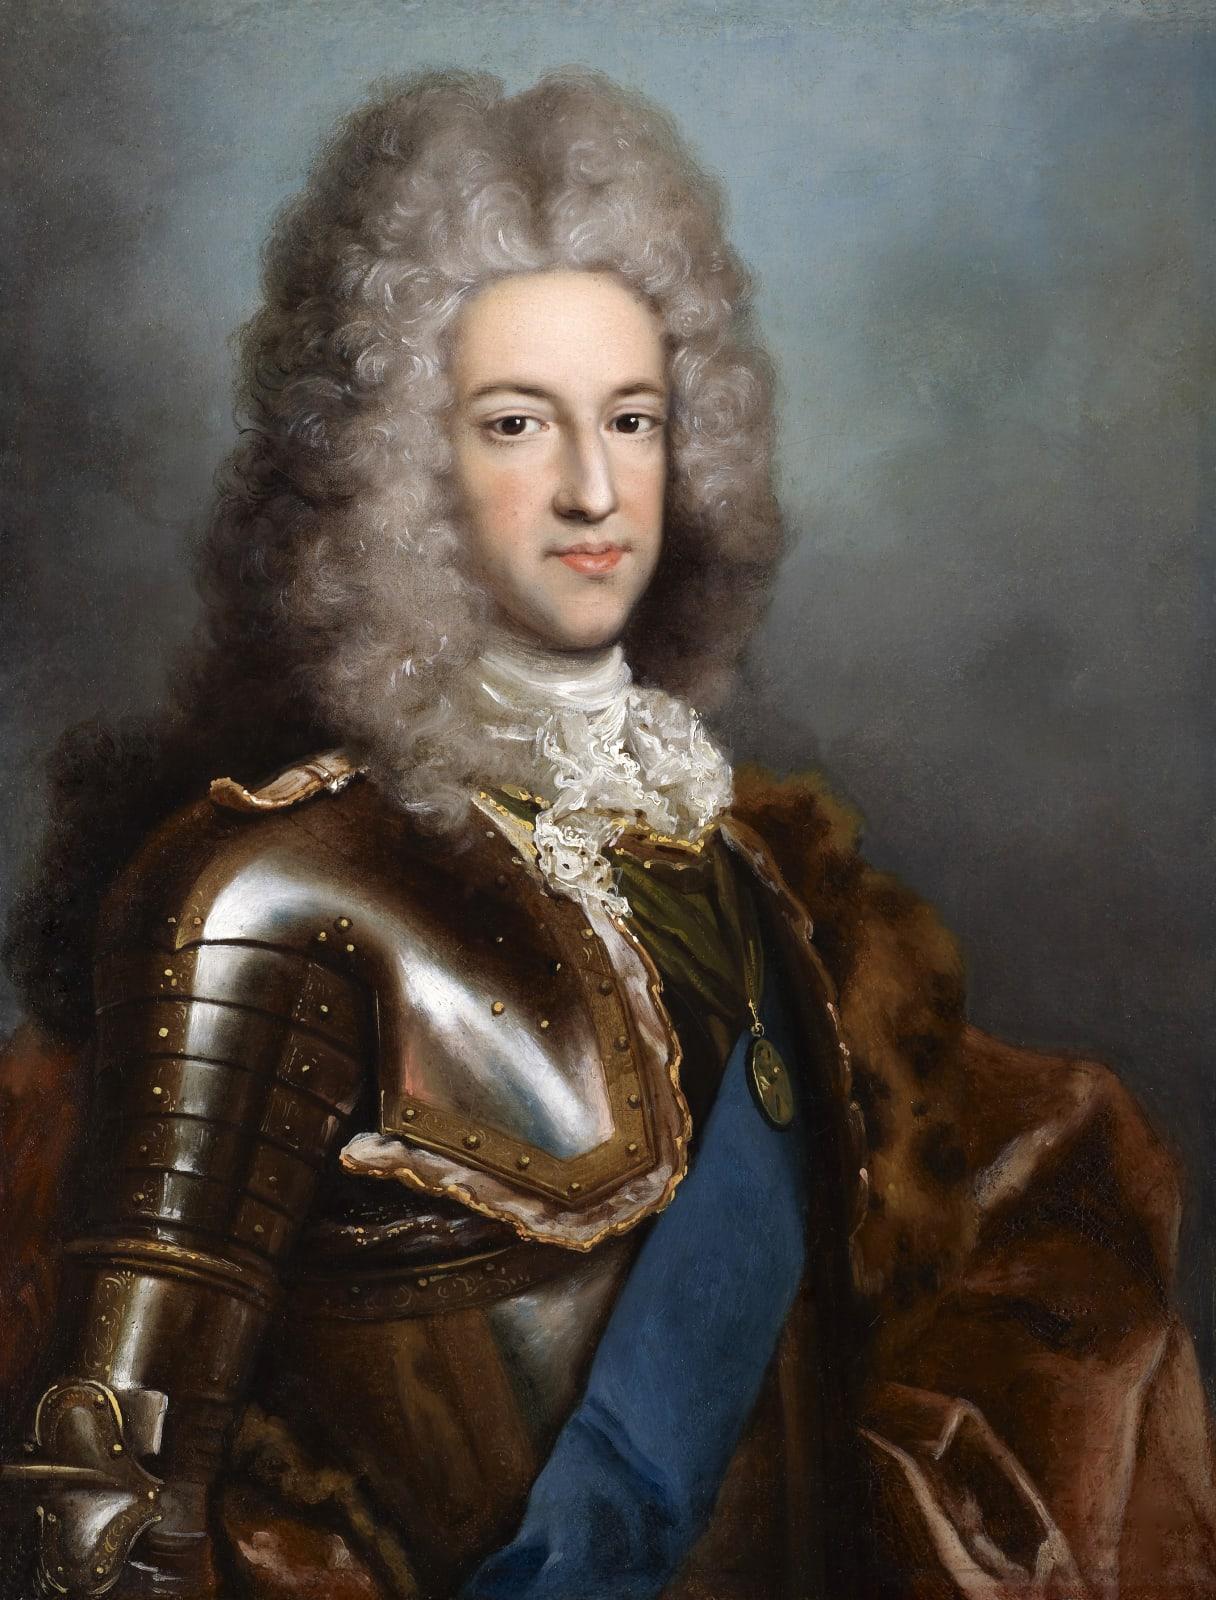 James Francis Edward Stuart, the 'Old Pretender' (1688 – 1766)